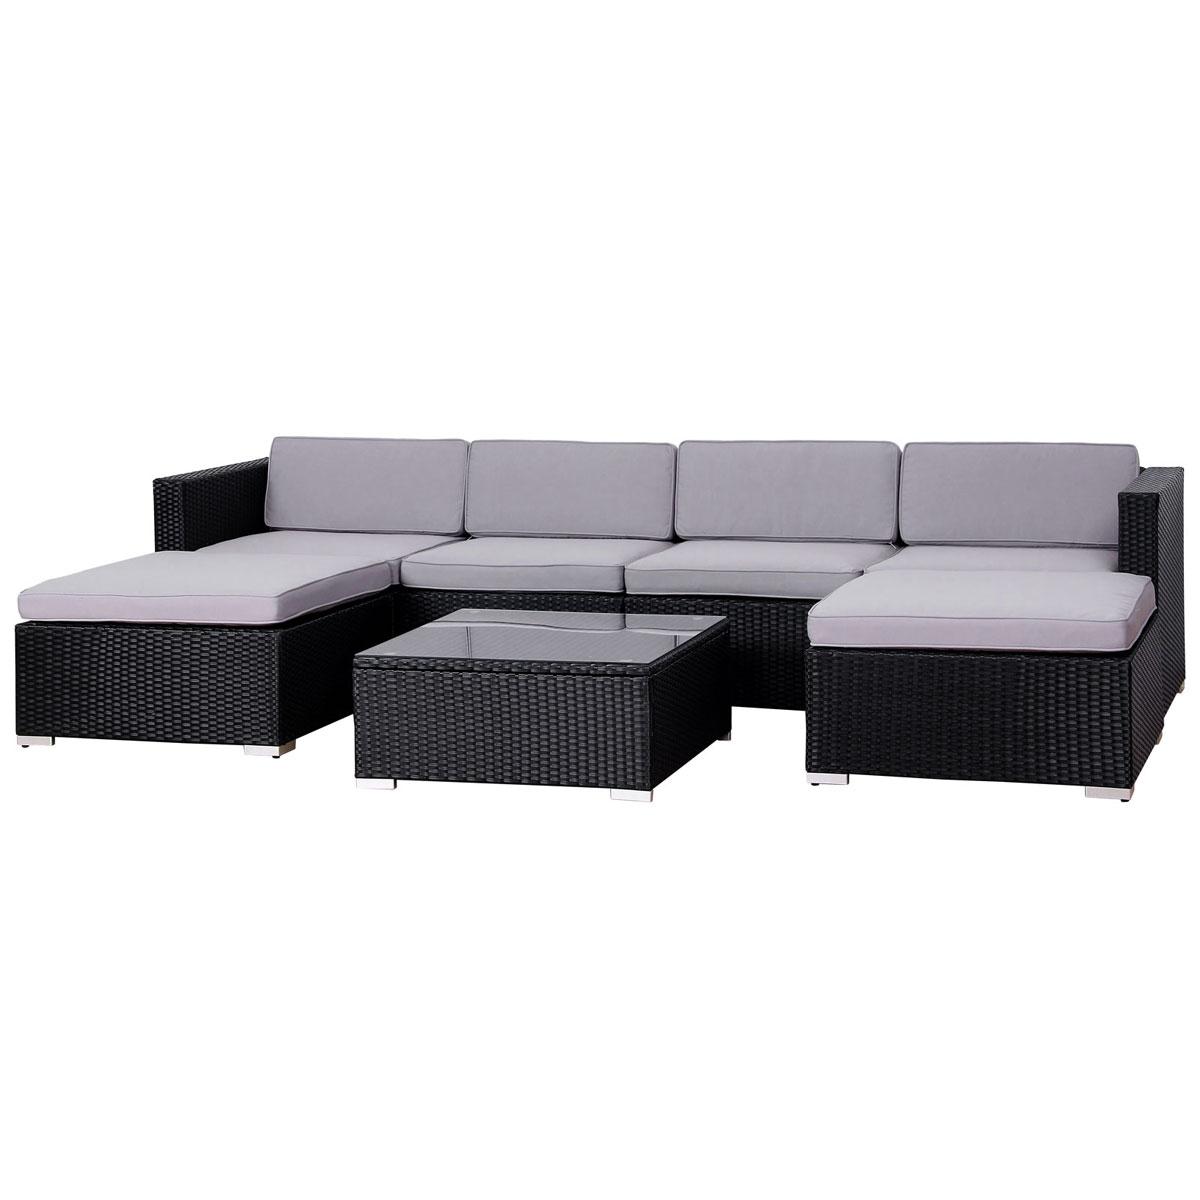 90948 SVITA LUGANO Poly Rattan Lounge XXL schwarz